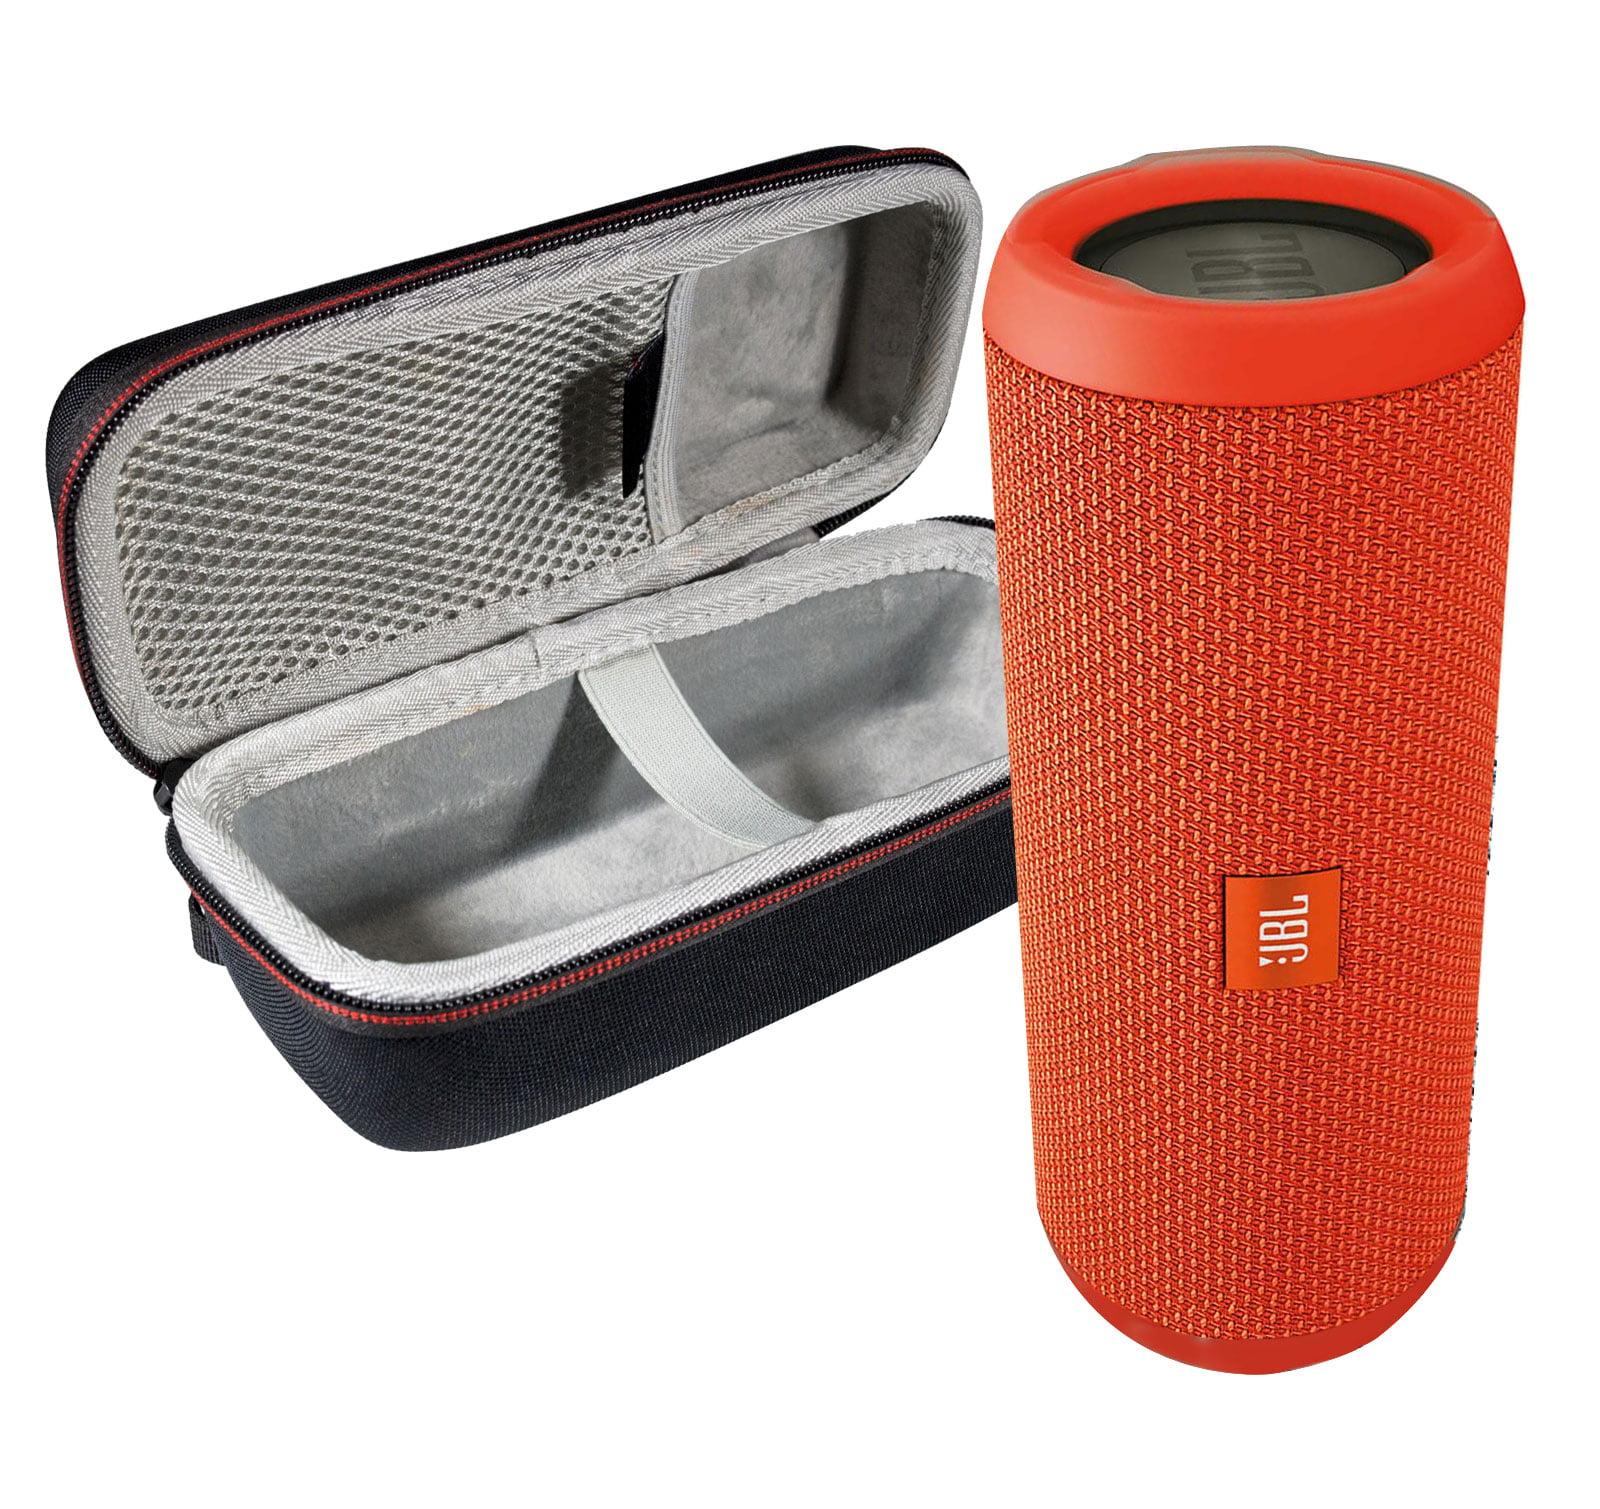 JBL FLIP 3 Orange Portable BT Speaker w/Case